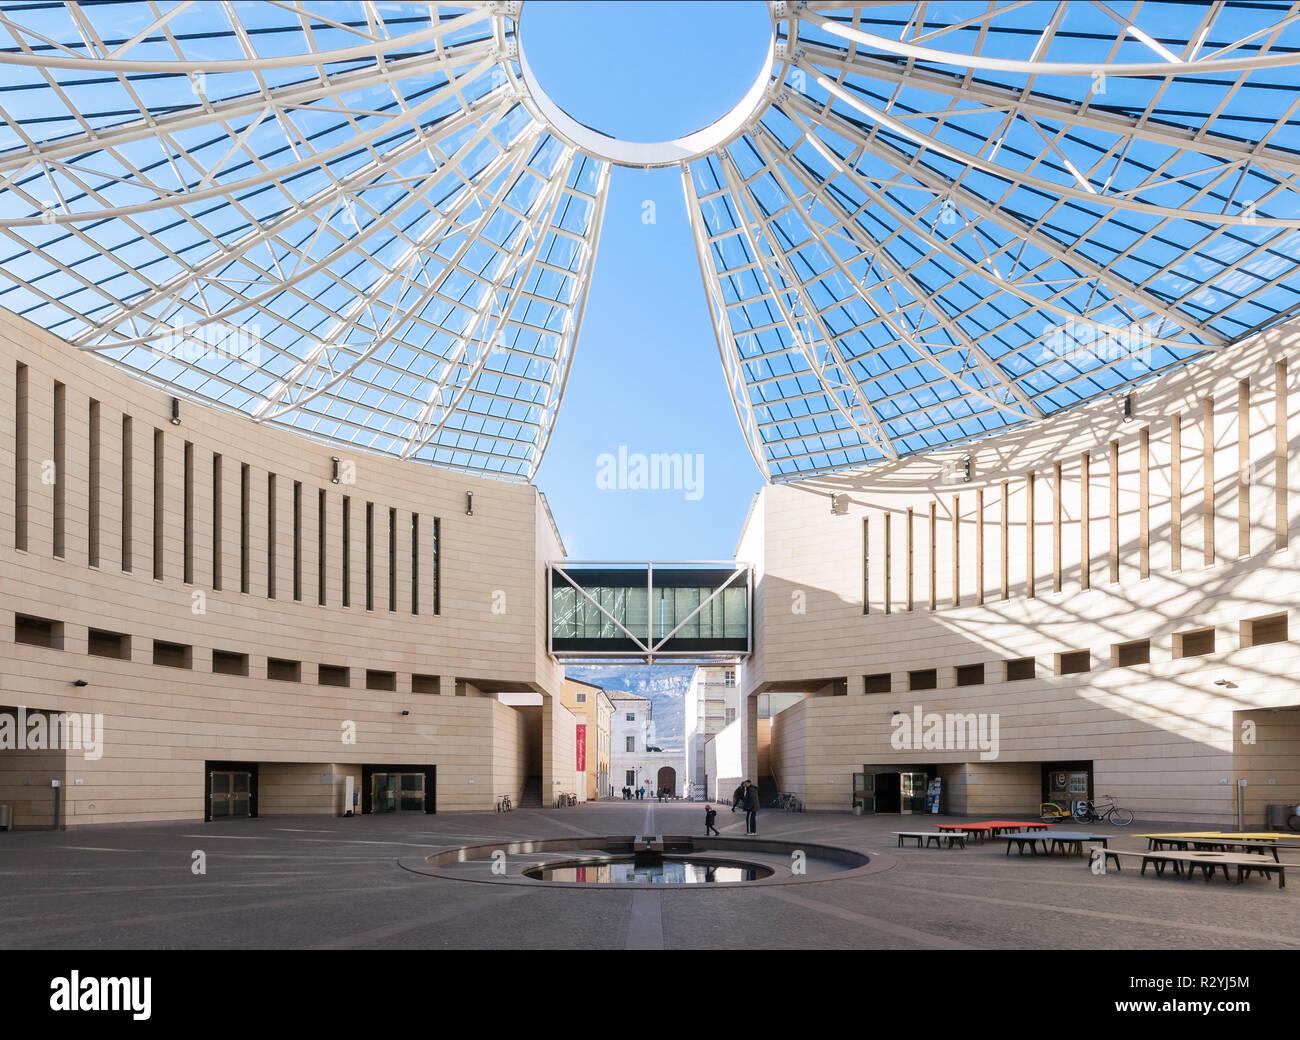 Rovereto stock photos rovereto stock images alamy for Museo d arte moderna e contemporanea di trento e rovereto